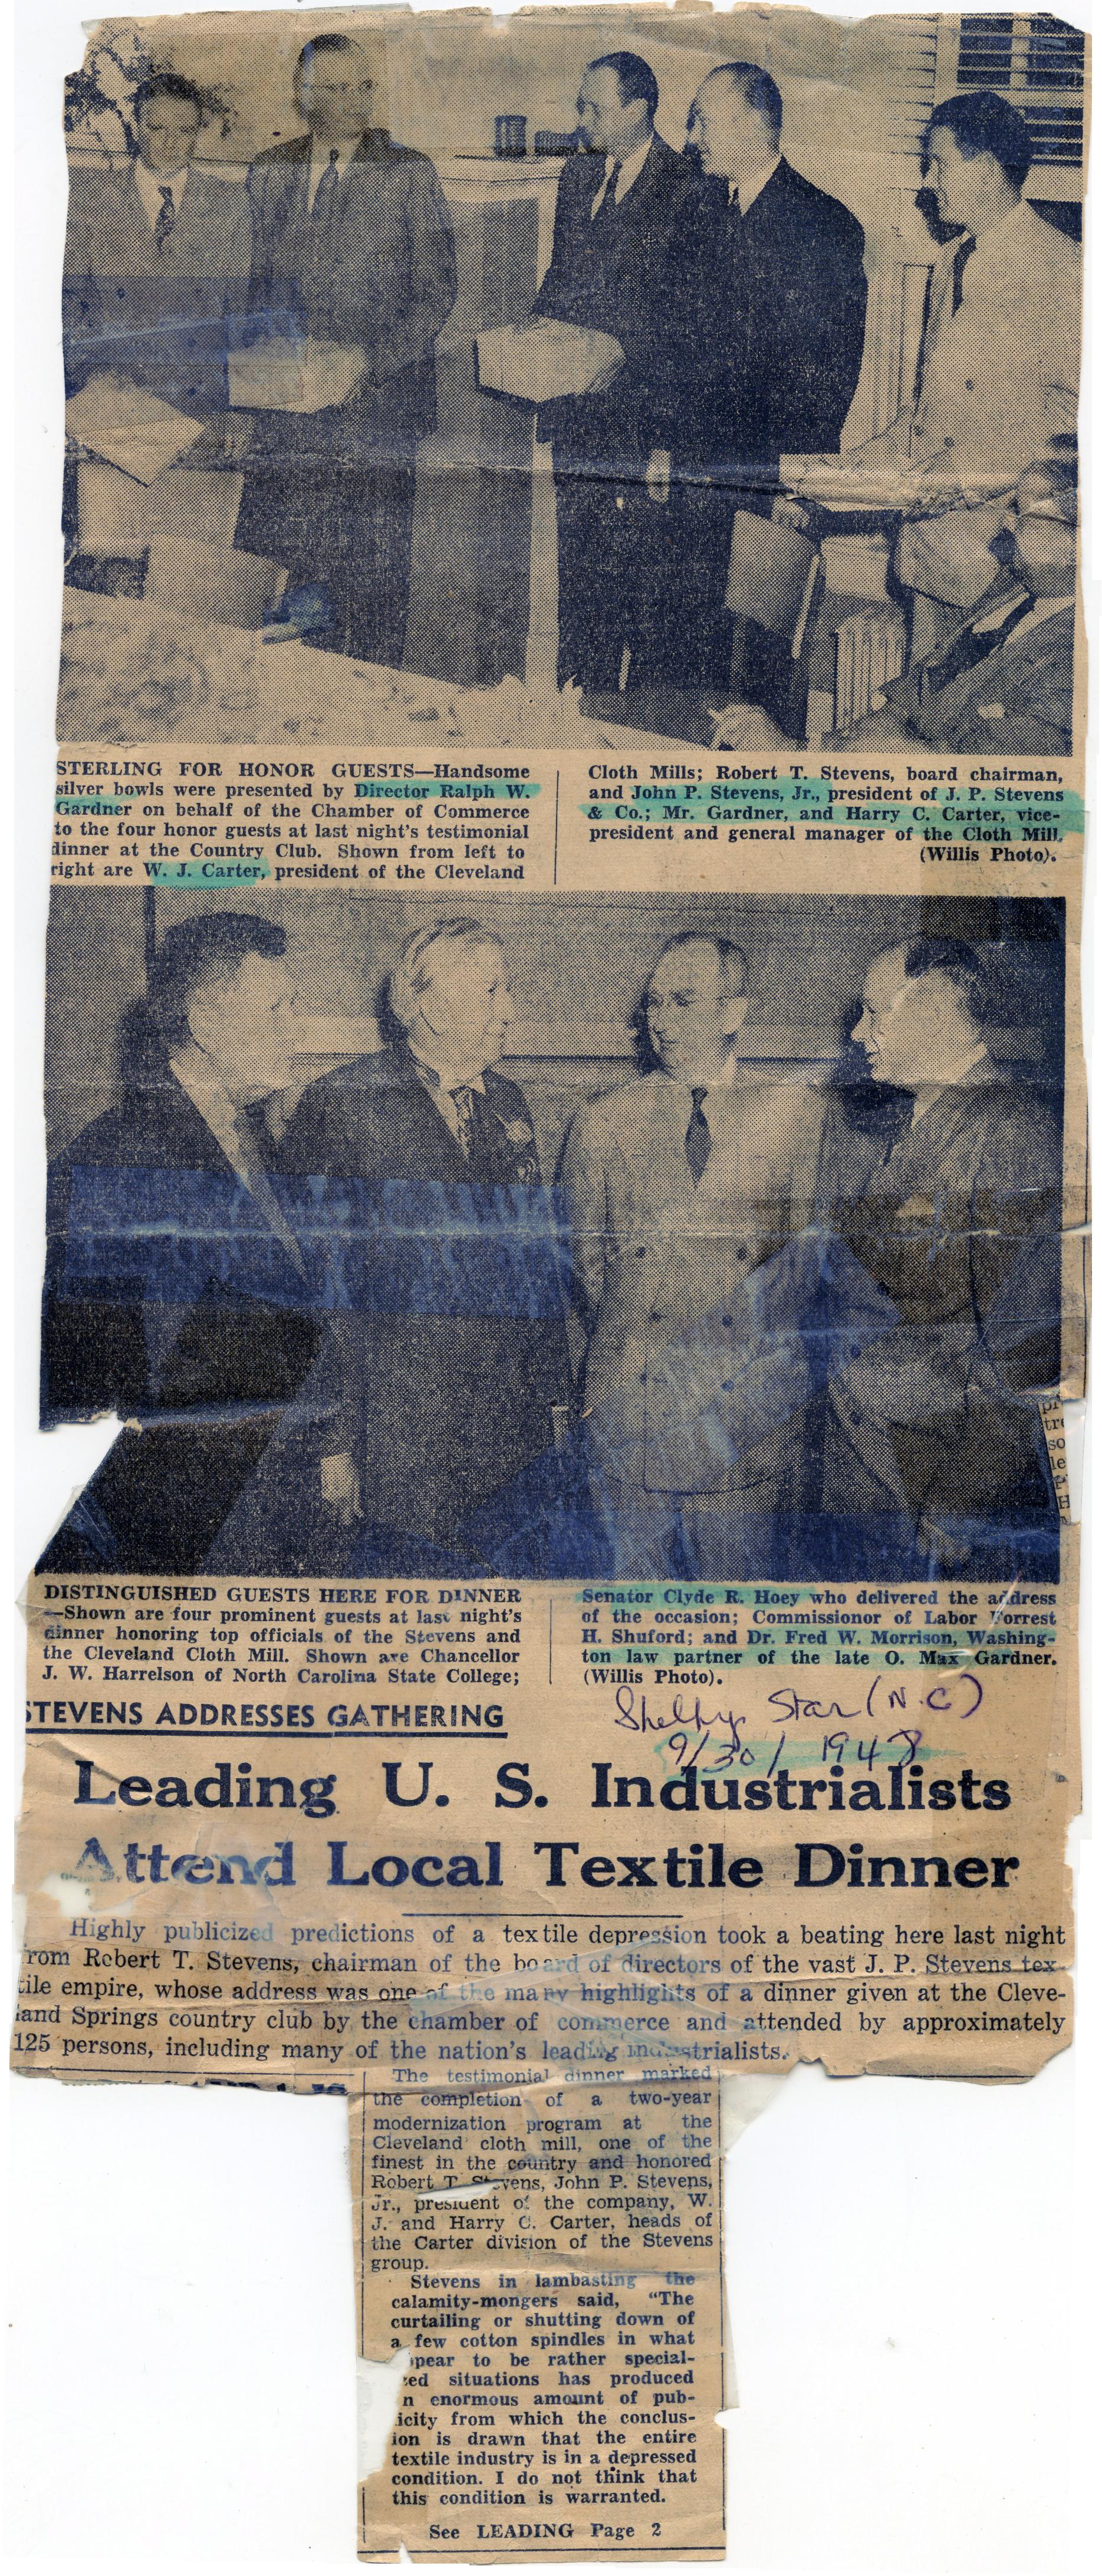 Industrialists